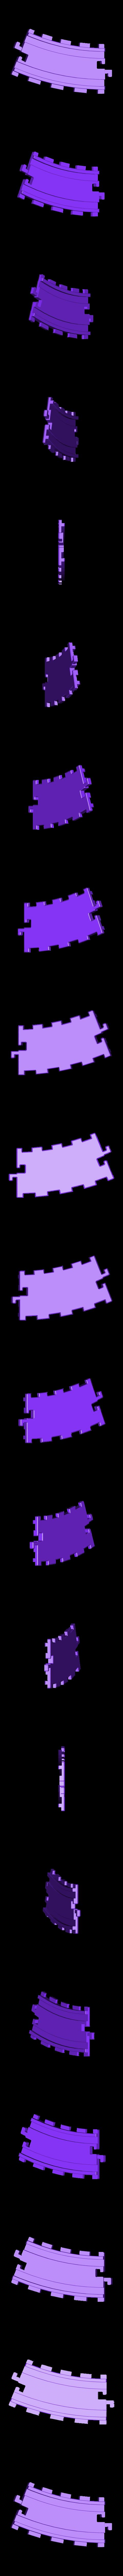 SmallToys-RailCurve.stl Download STL file SmallToys - Starter Pack • 3D printer model, Wabby